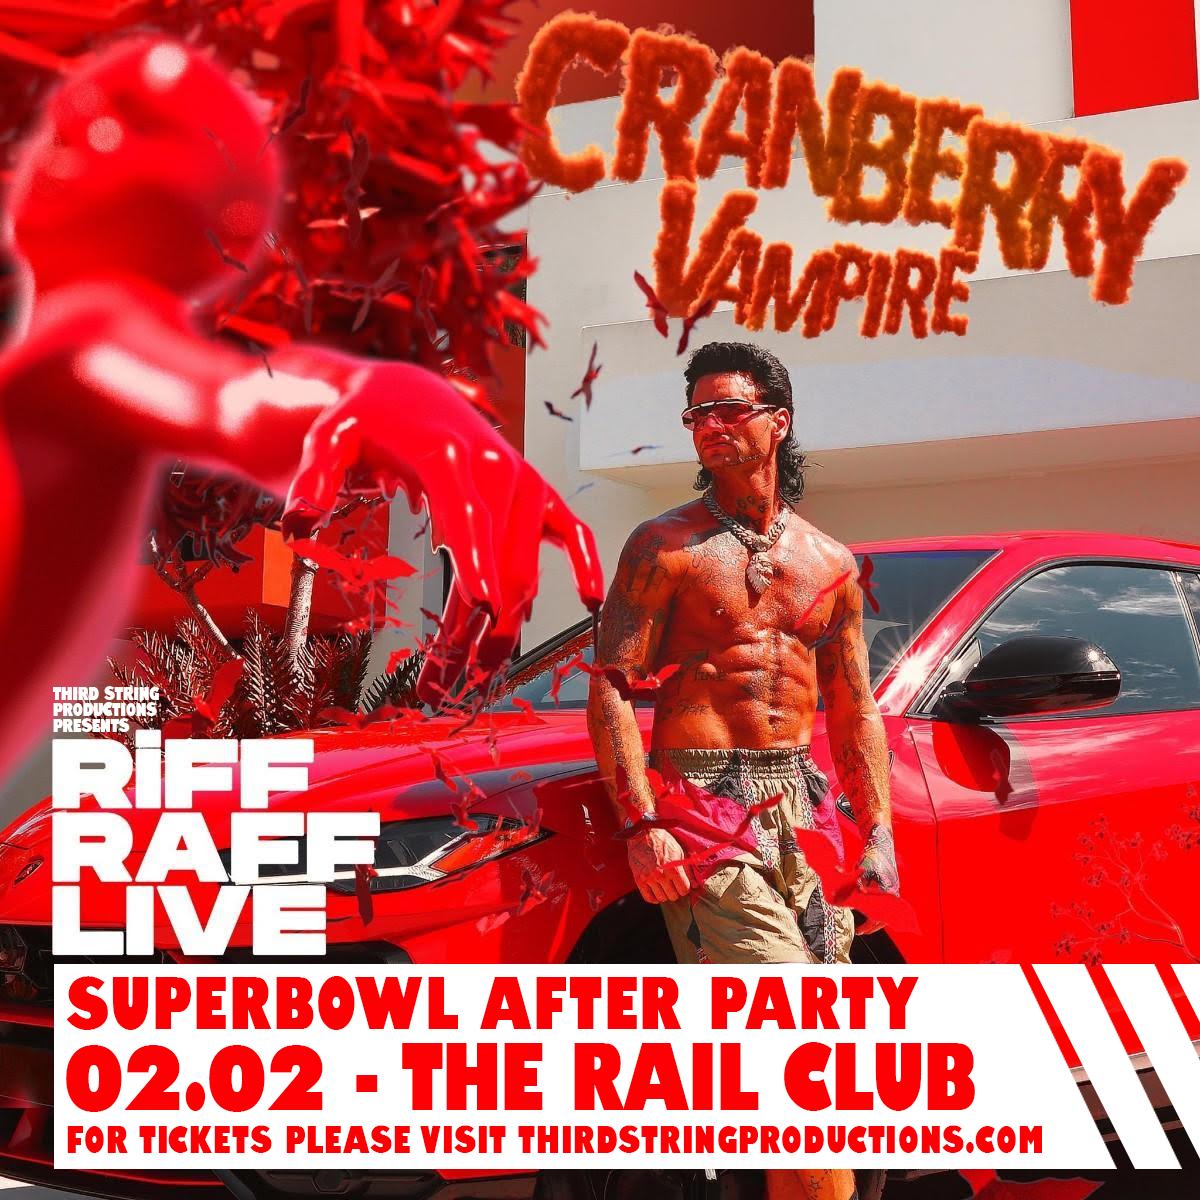 RiFF RAFF's Cranberry Vampire Super Bowl Party at The Rail Club